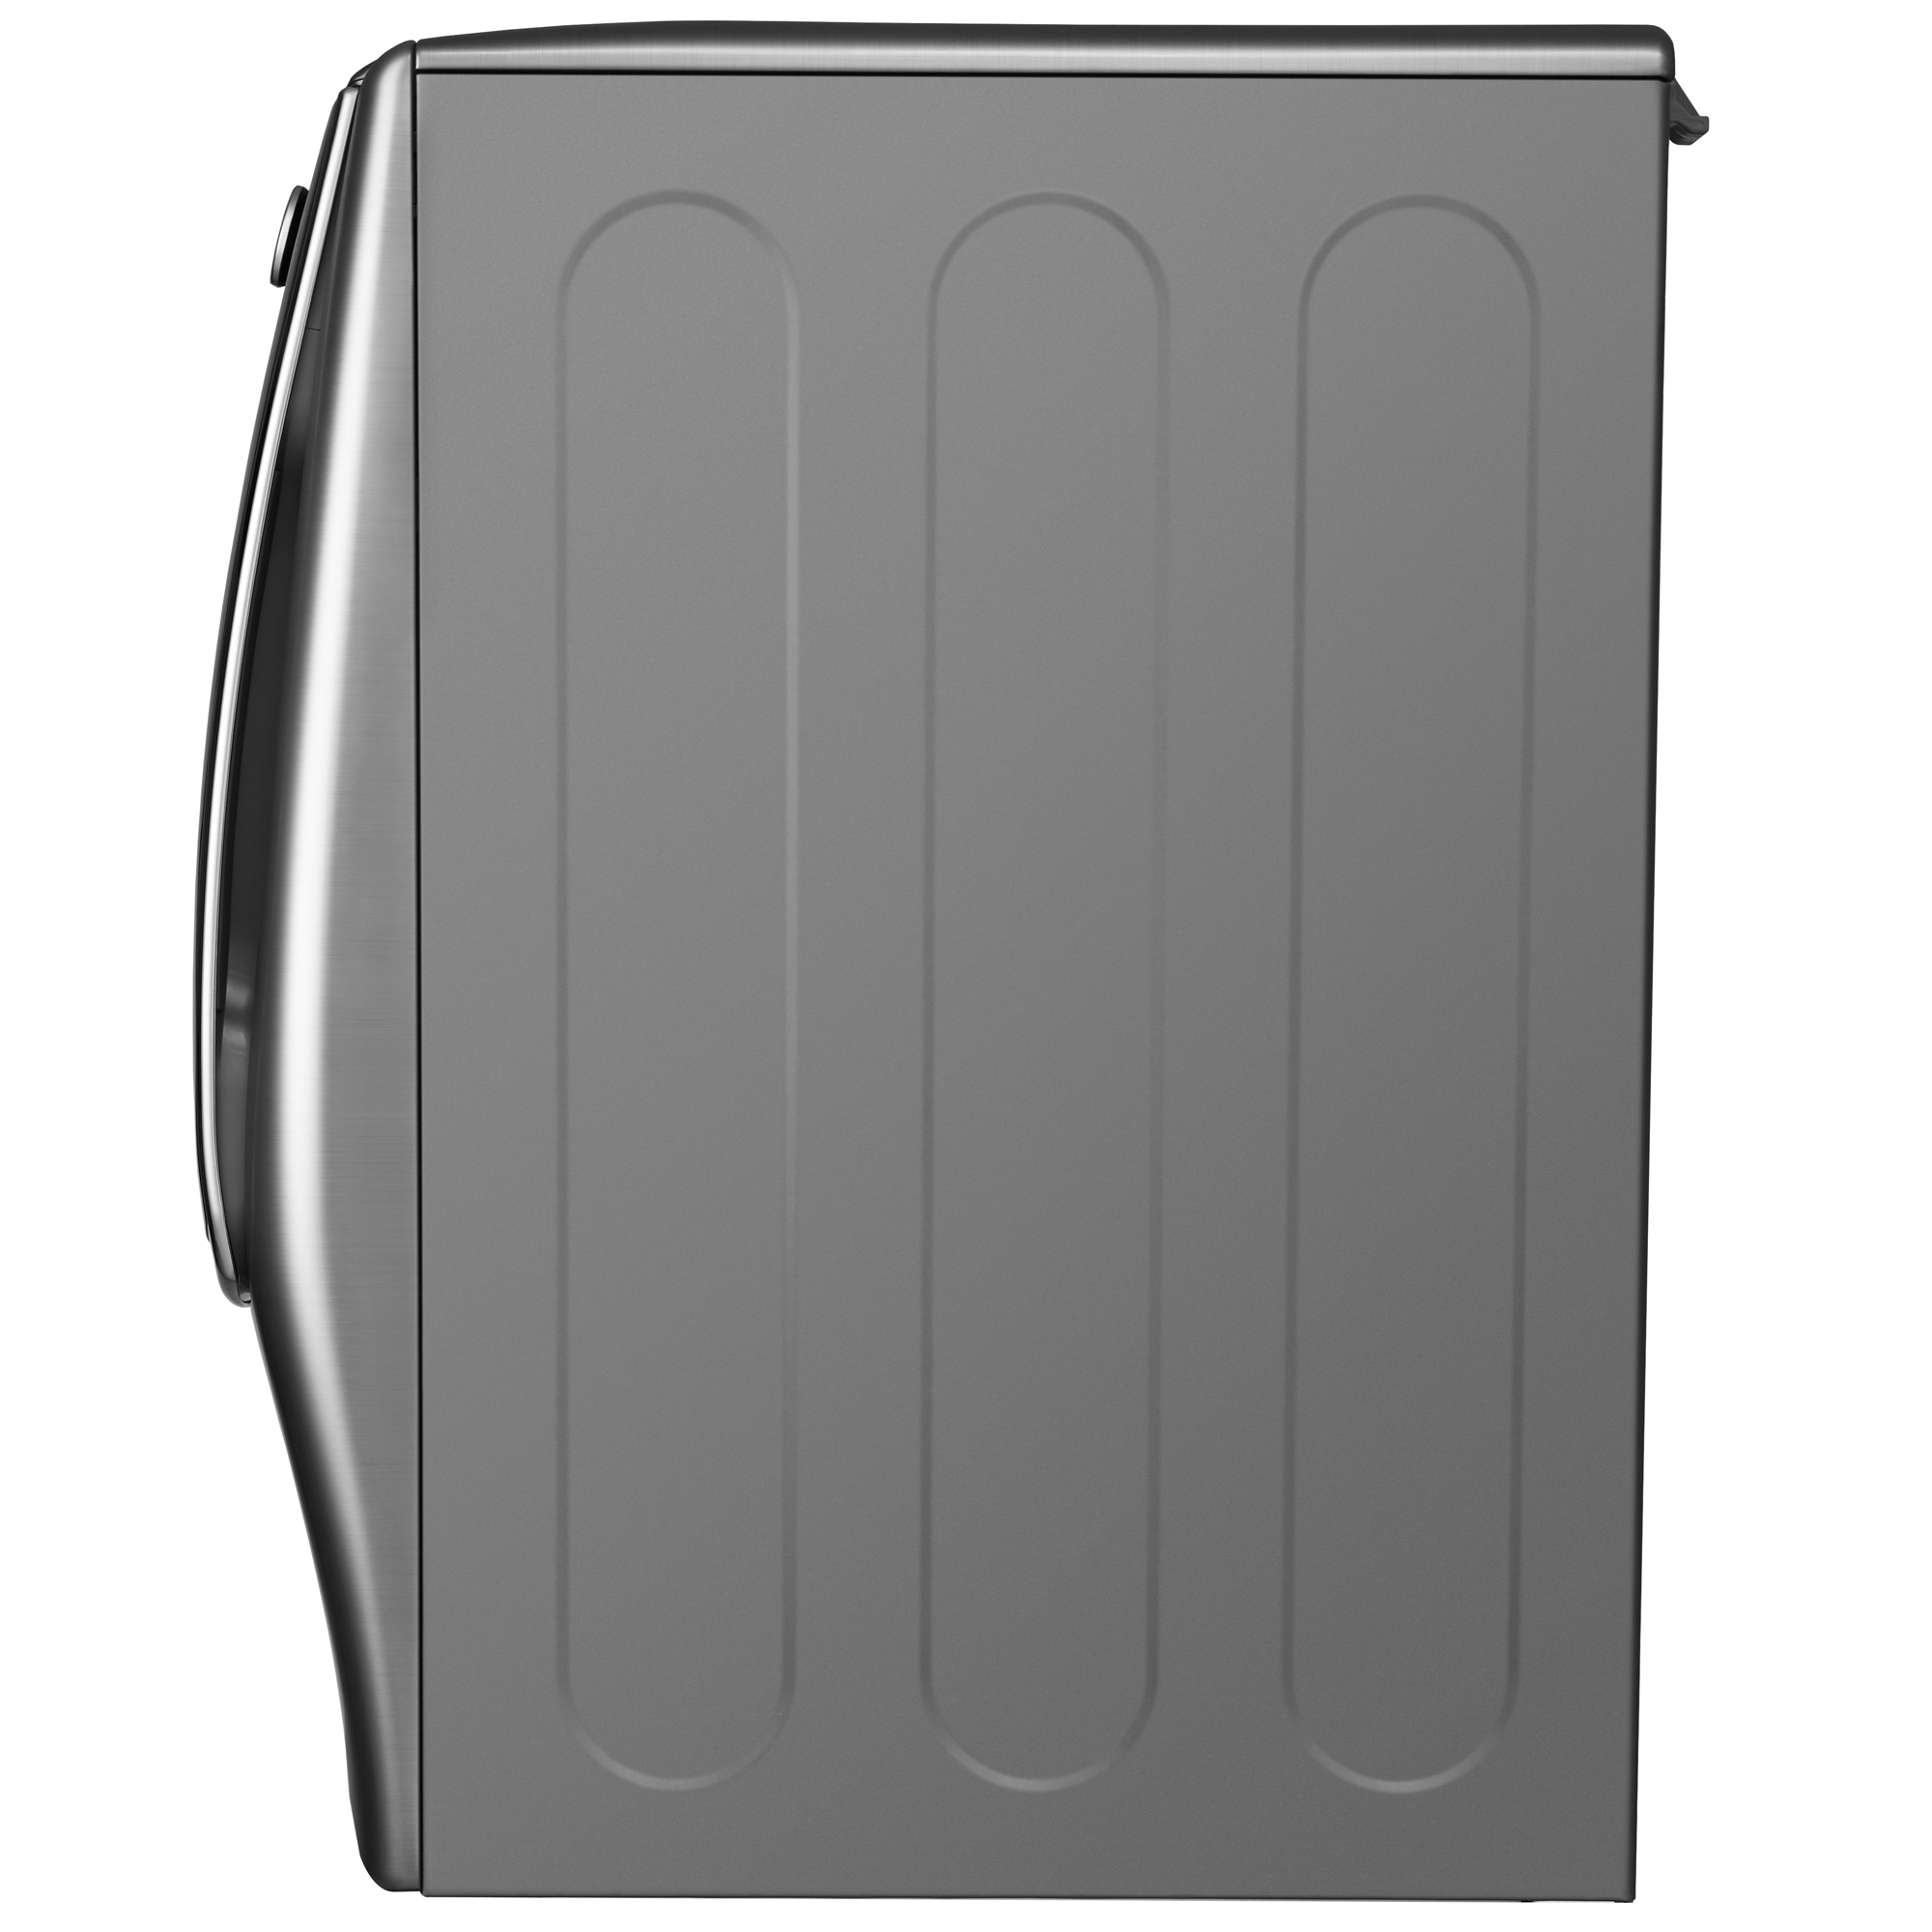 LG WM9000HVA 5.2 cu. ft. Mega Capacity Front Load Washer w/ TWIN Wash™ - Graphite Steel